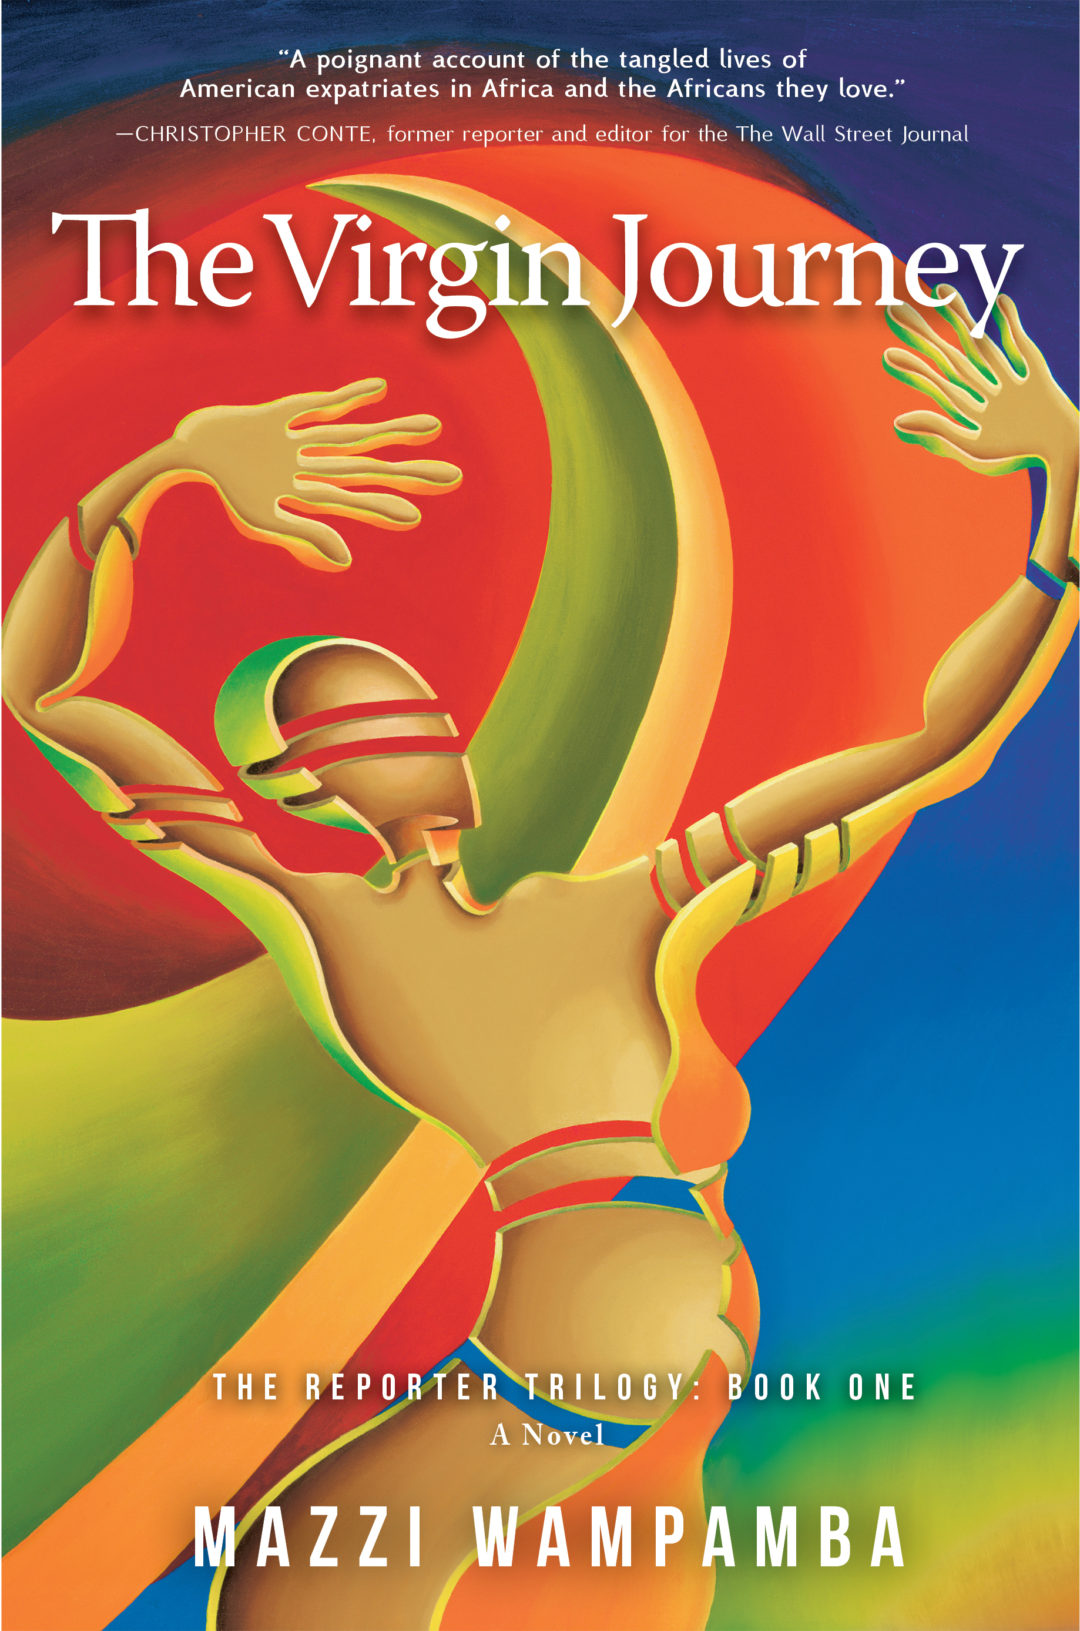 The Virgin Journey